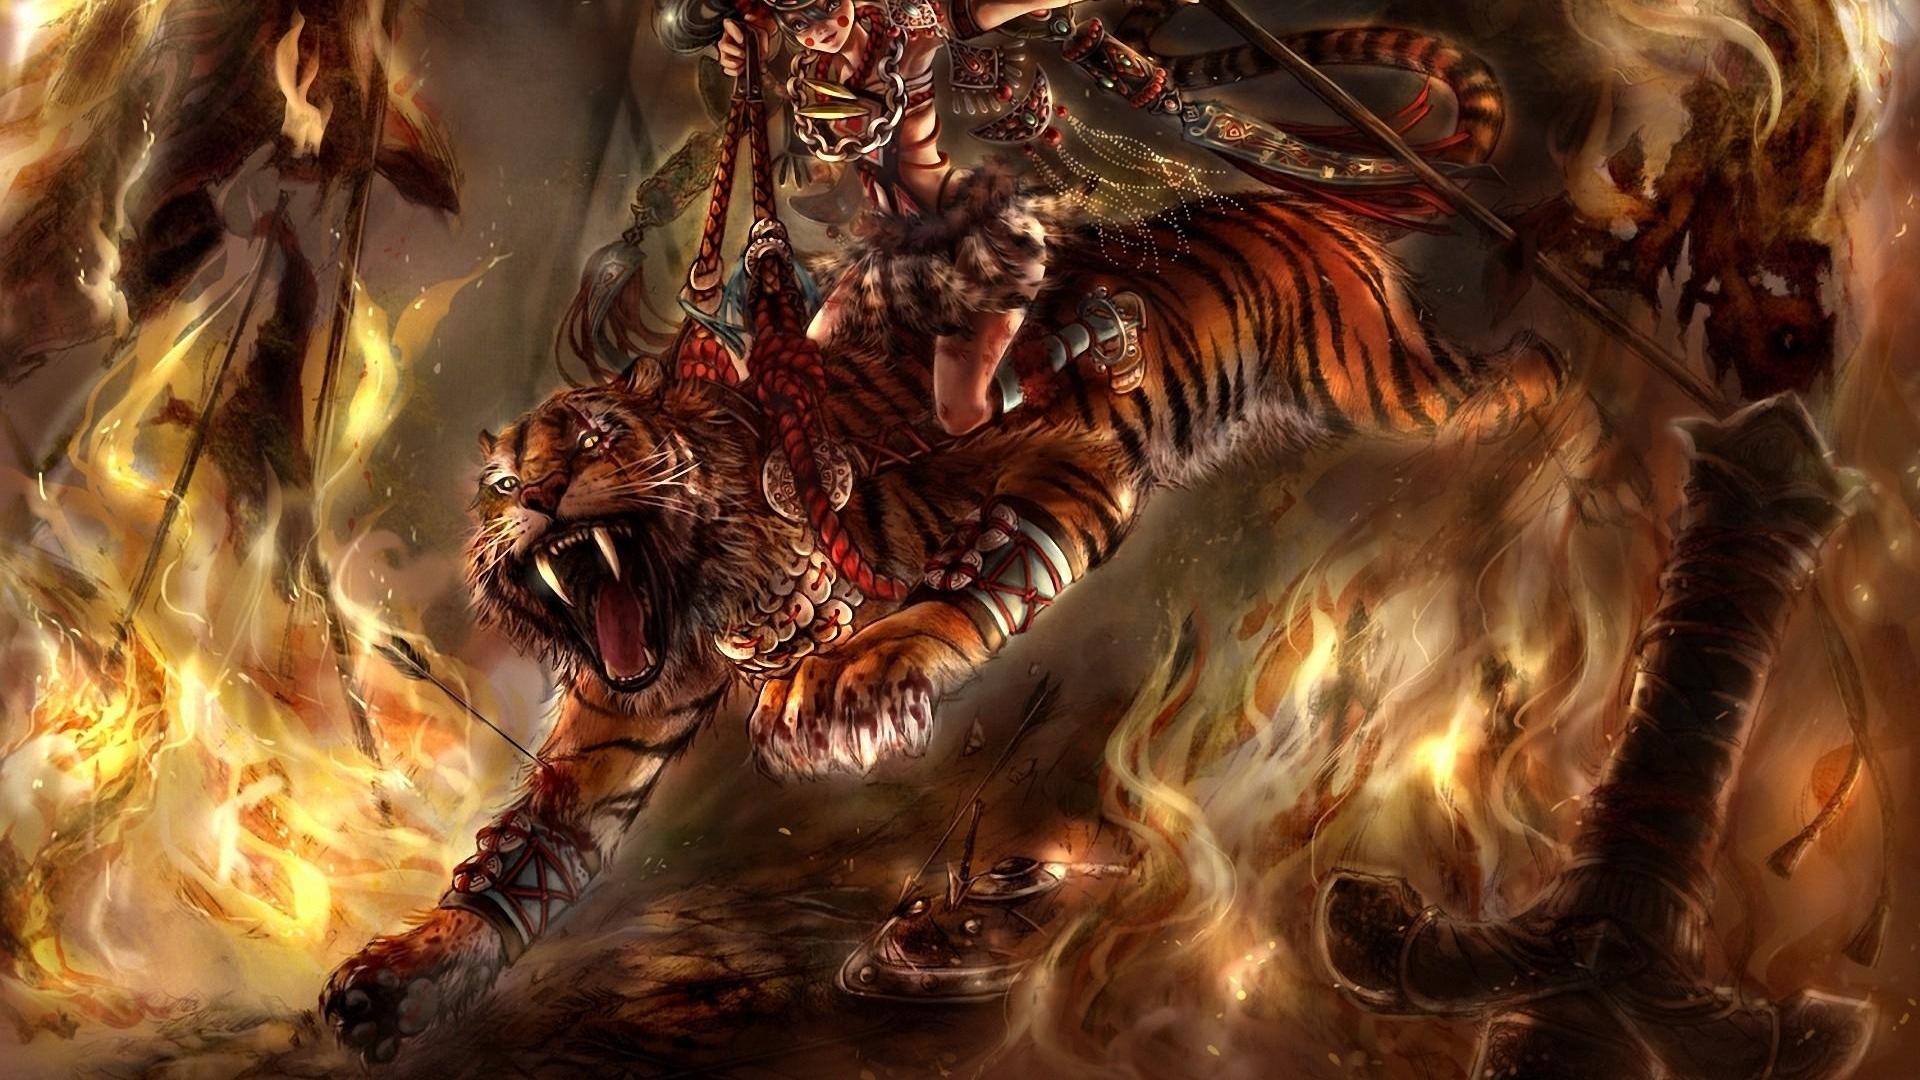 ... Ducati Diavel Tiger Fire Fantasy 2013 | El Tony ...